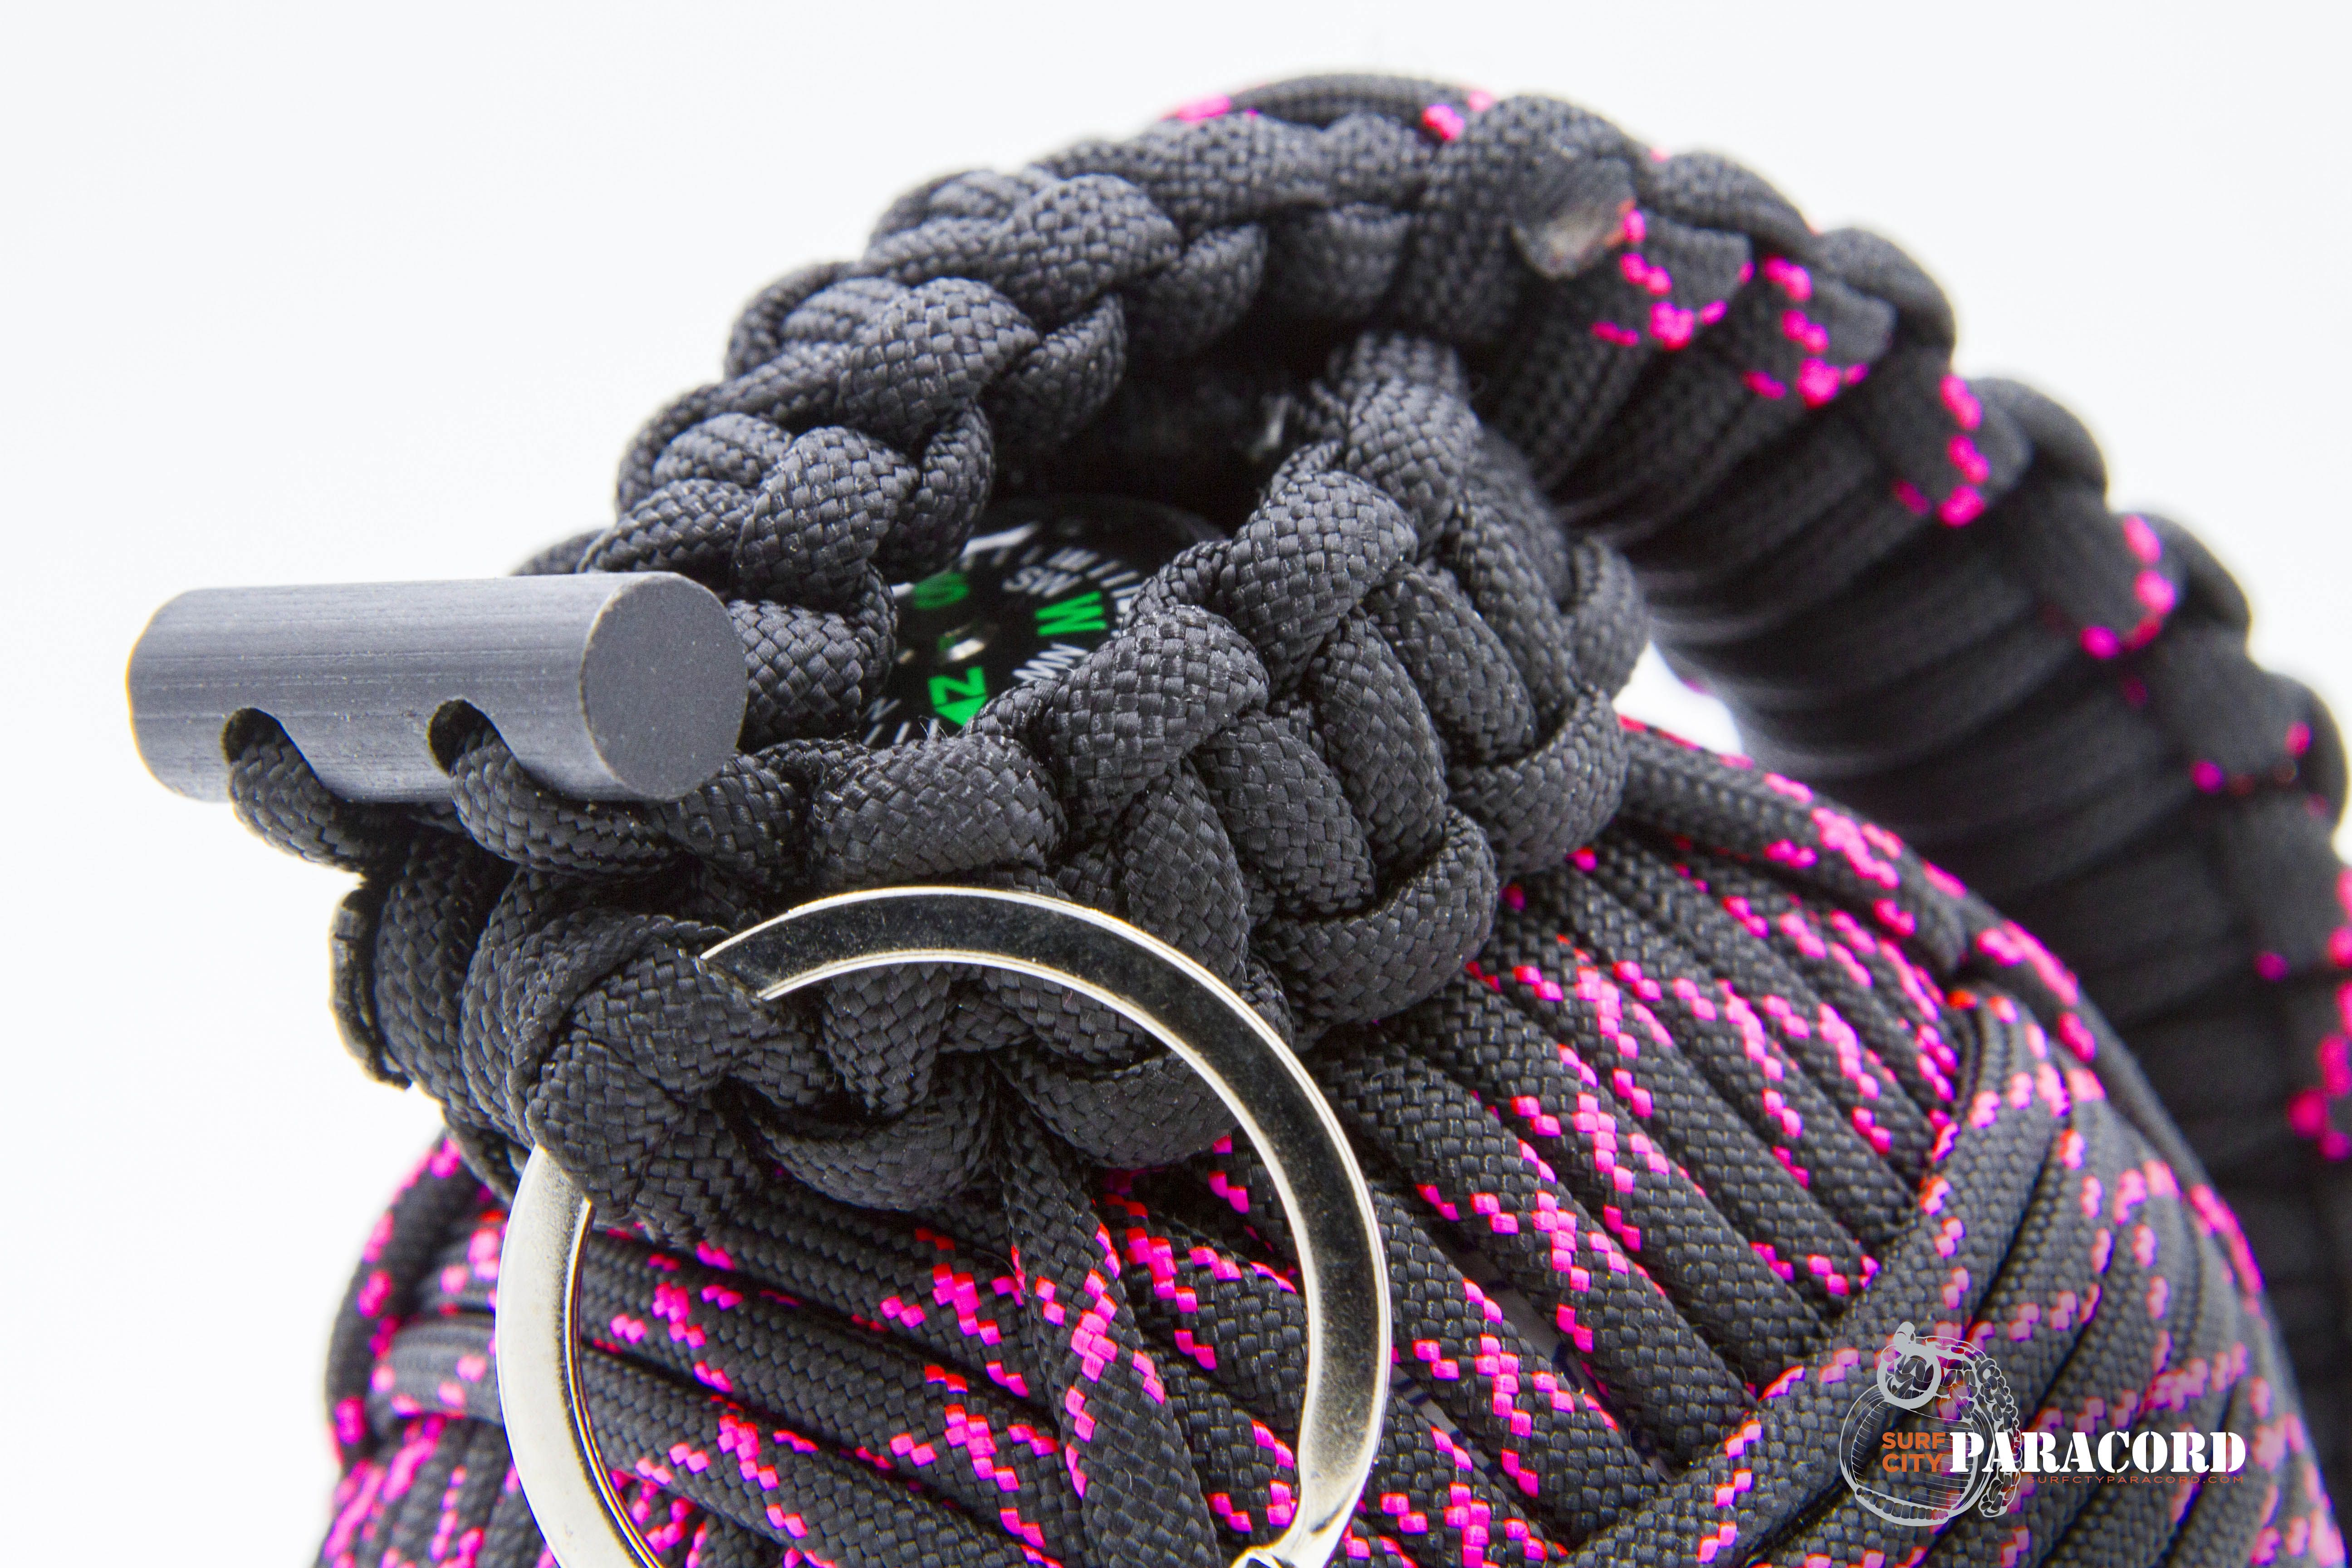 550 Paracord Survival Bracelet King Cobra Black//Pink Camping Tactical